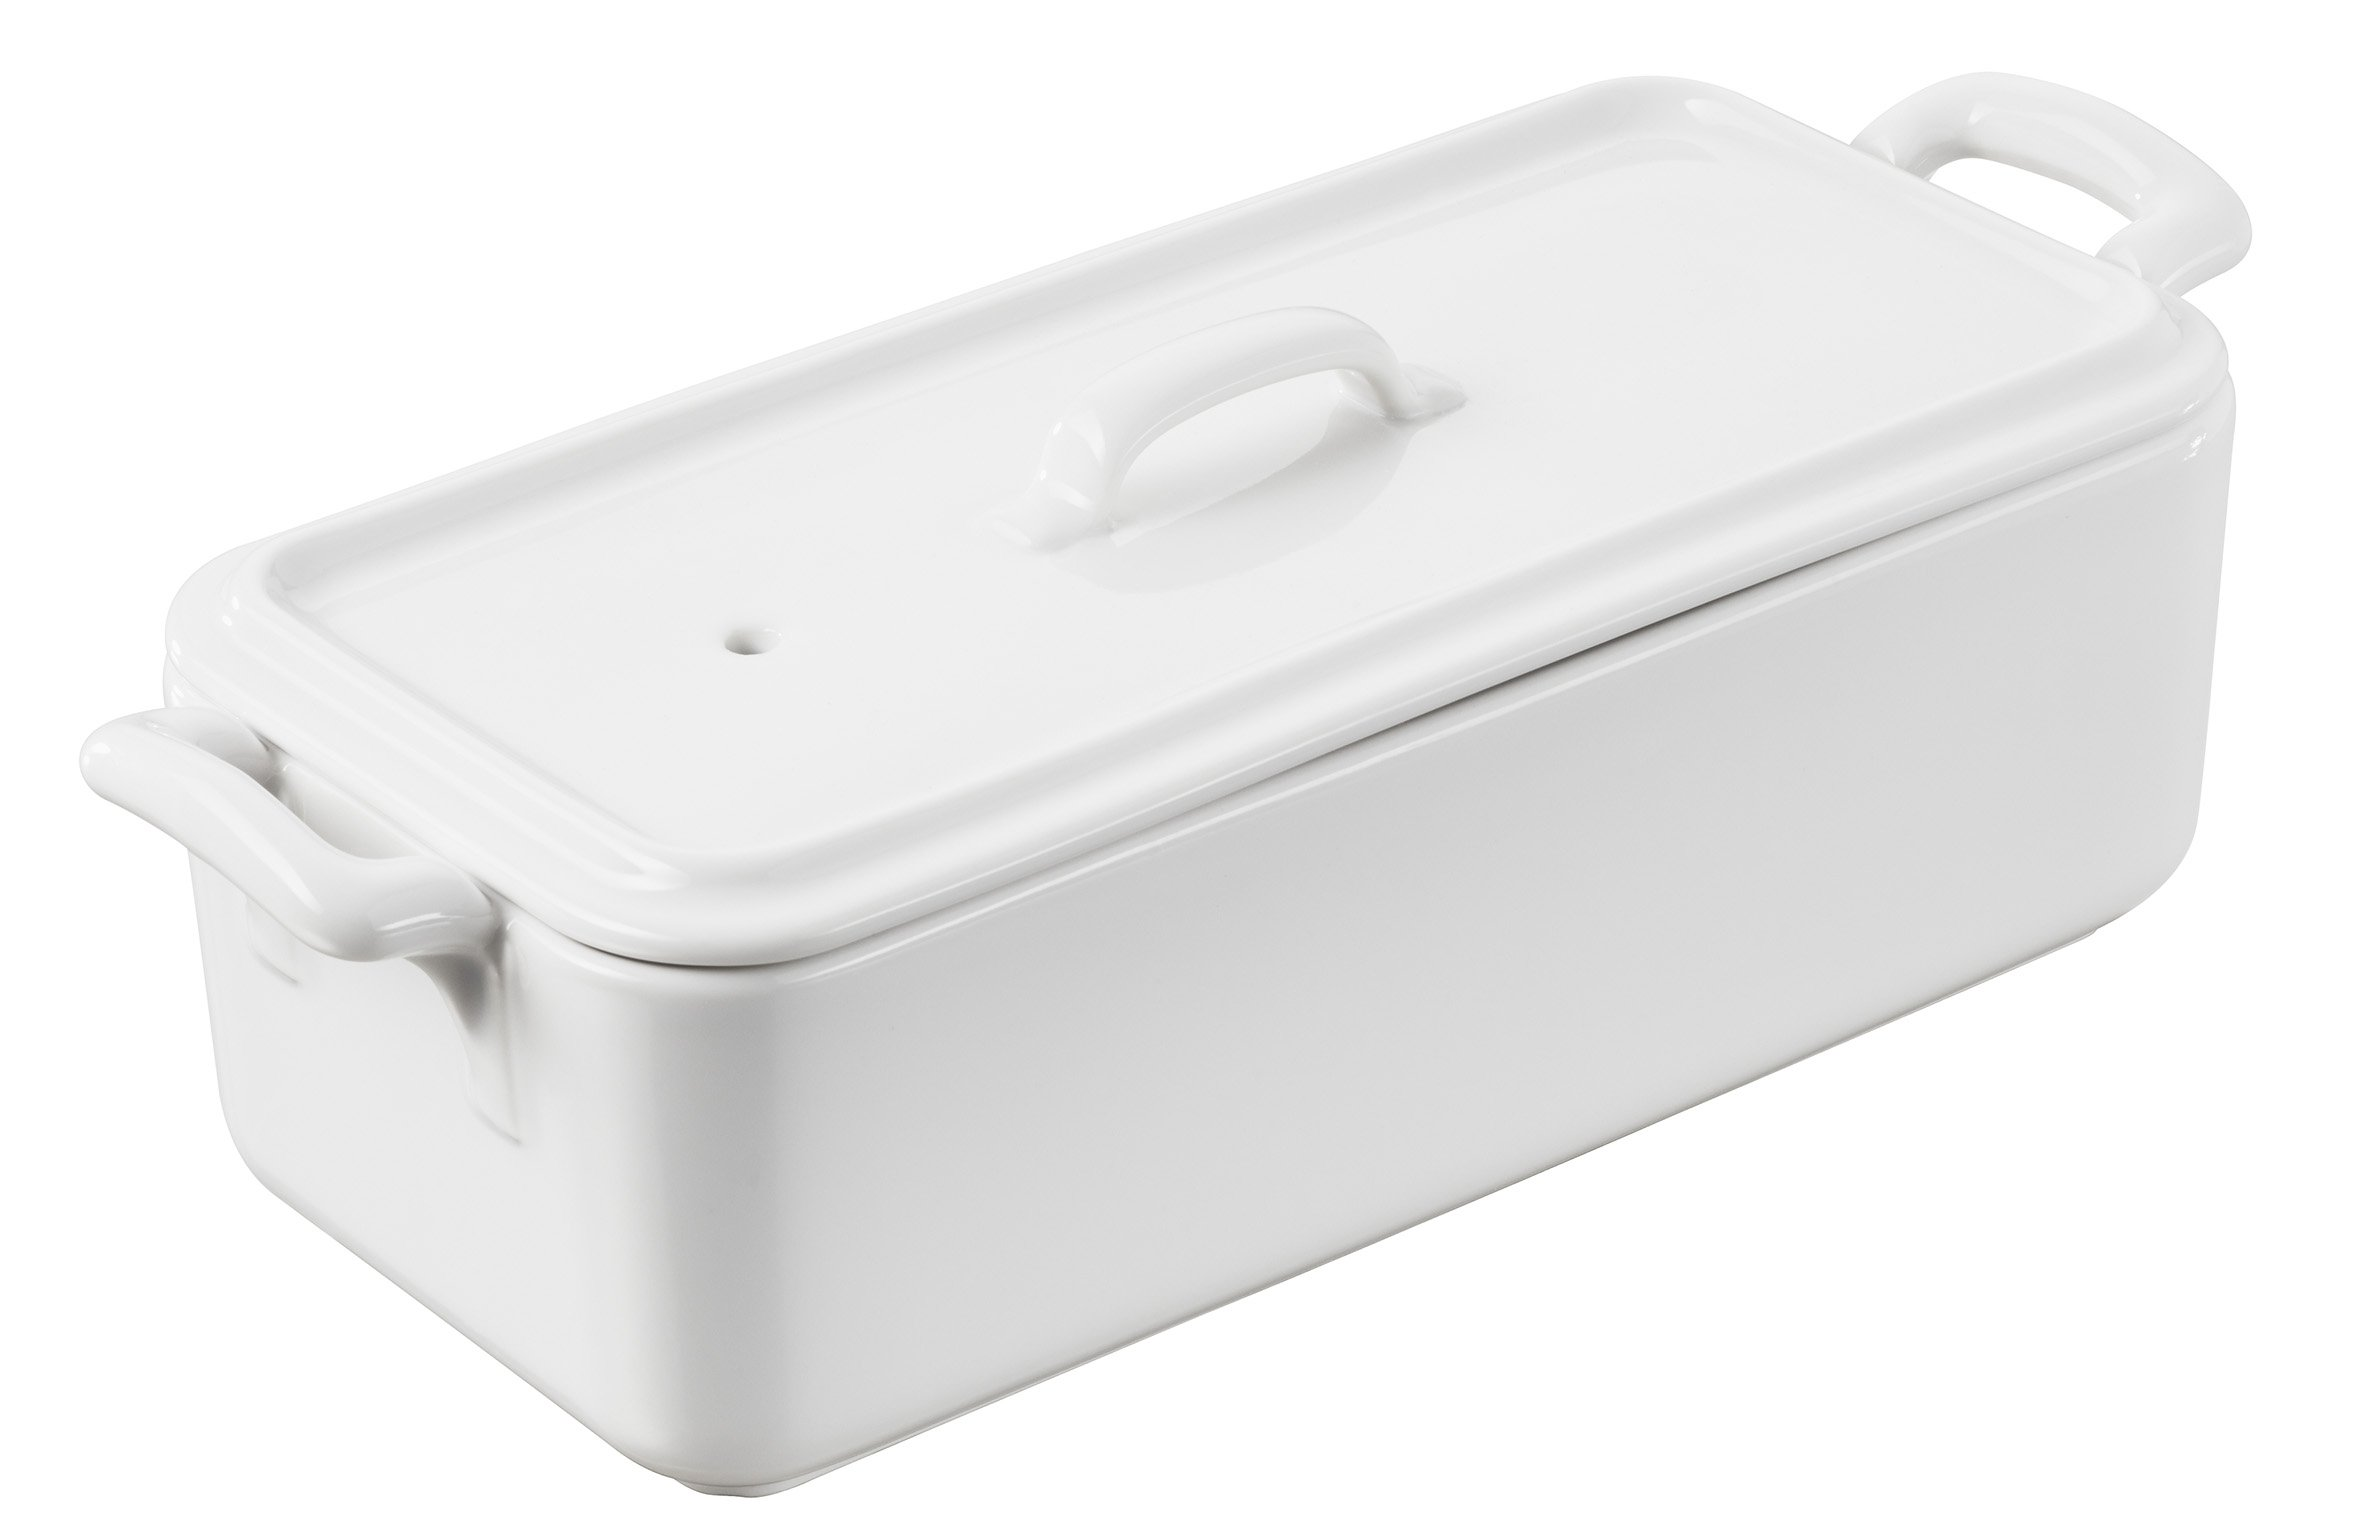 Revol 618410 BC081000 Terrine with lid 35.25 Oz White